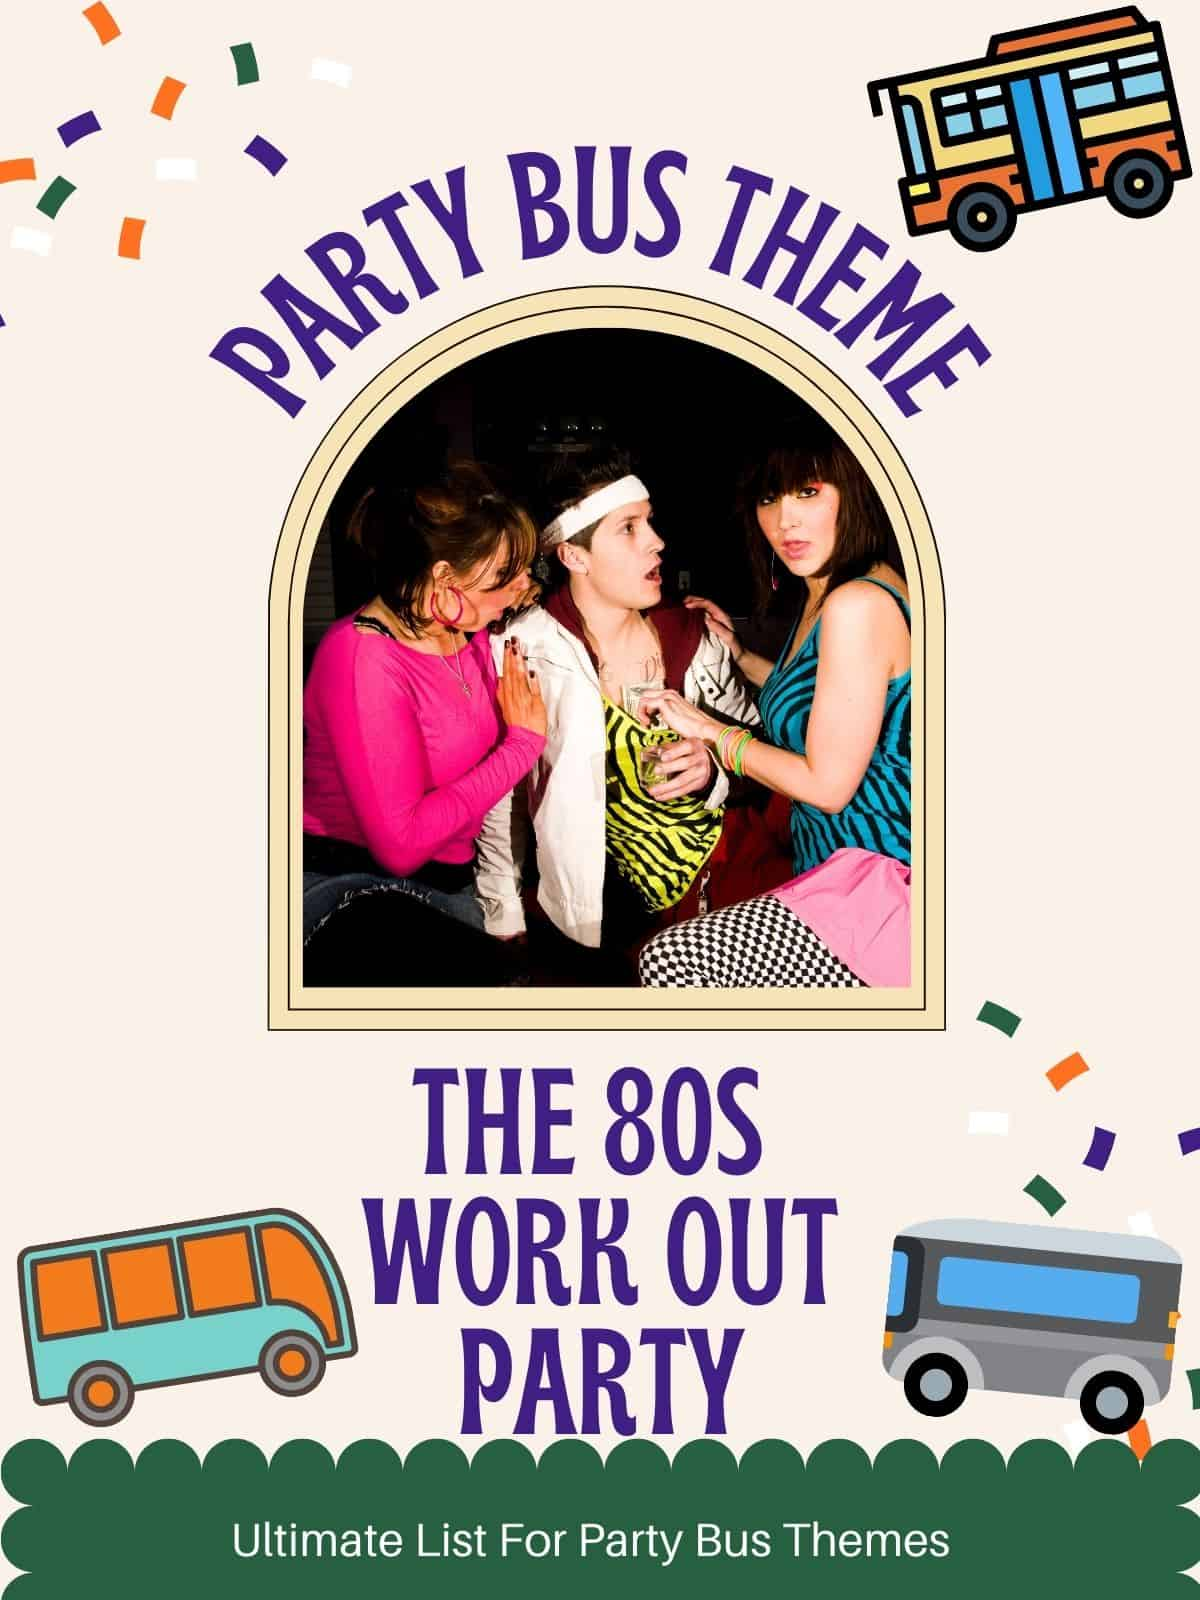 people dressed like the 80s